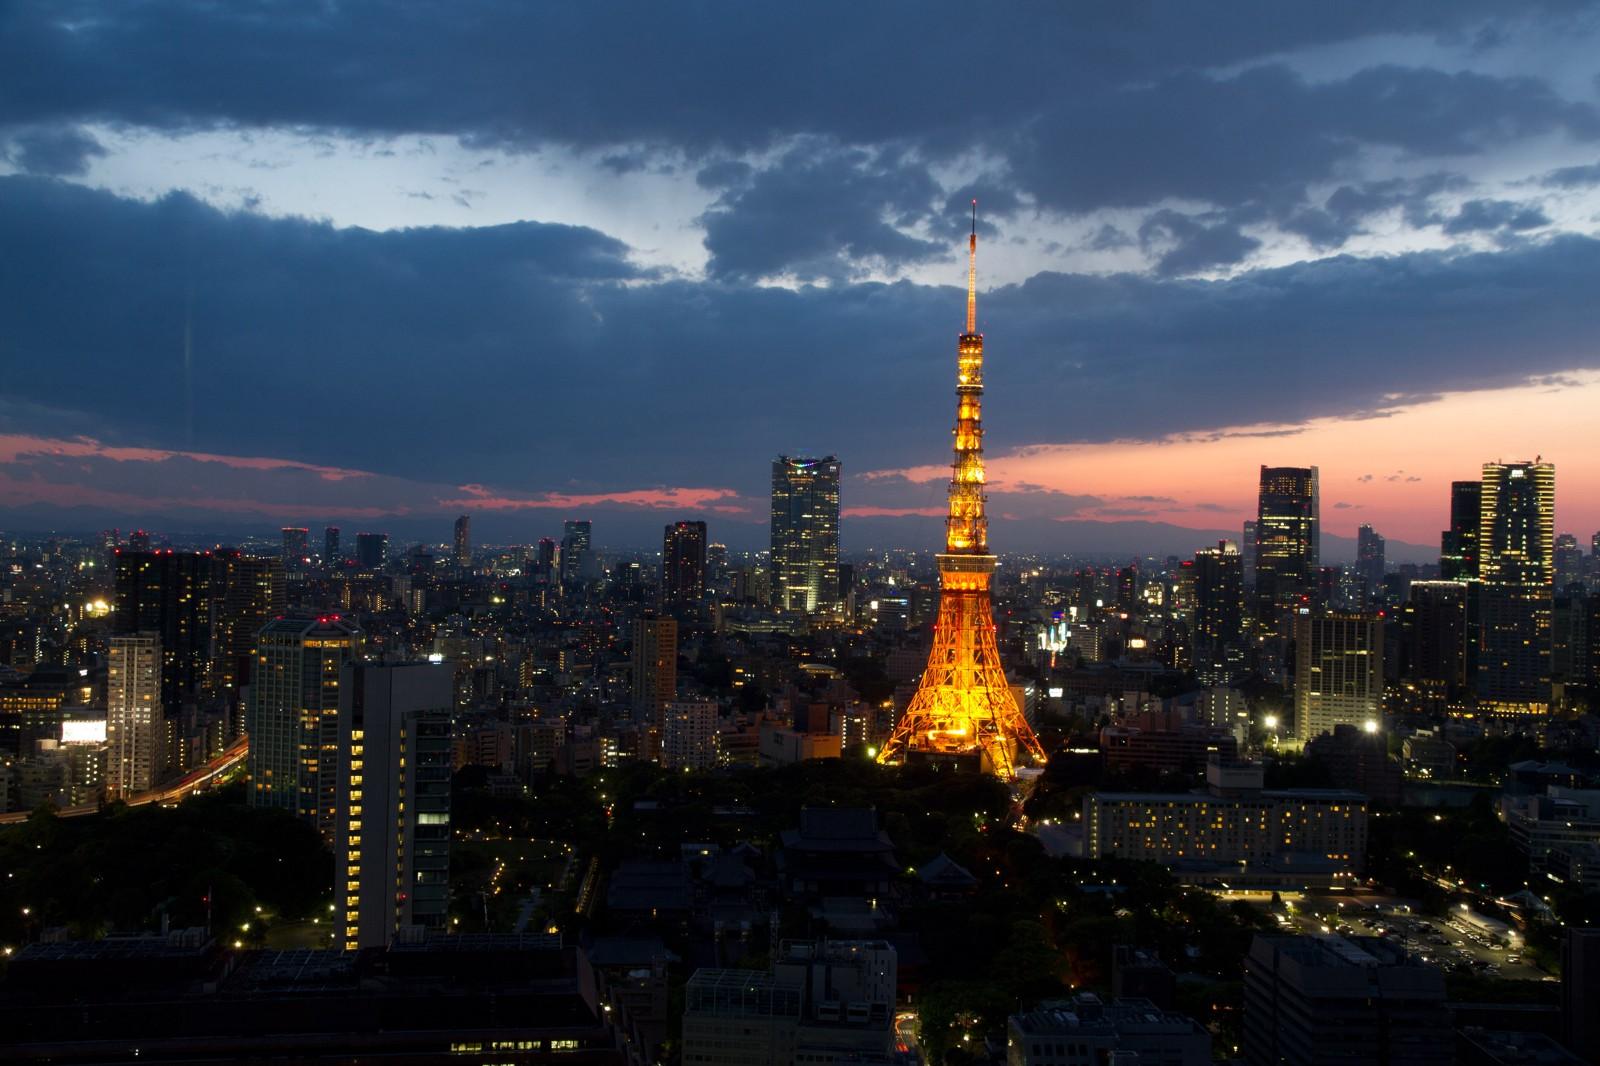 6% OFF Tokyo Tower Ticket